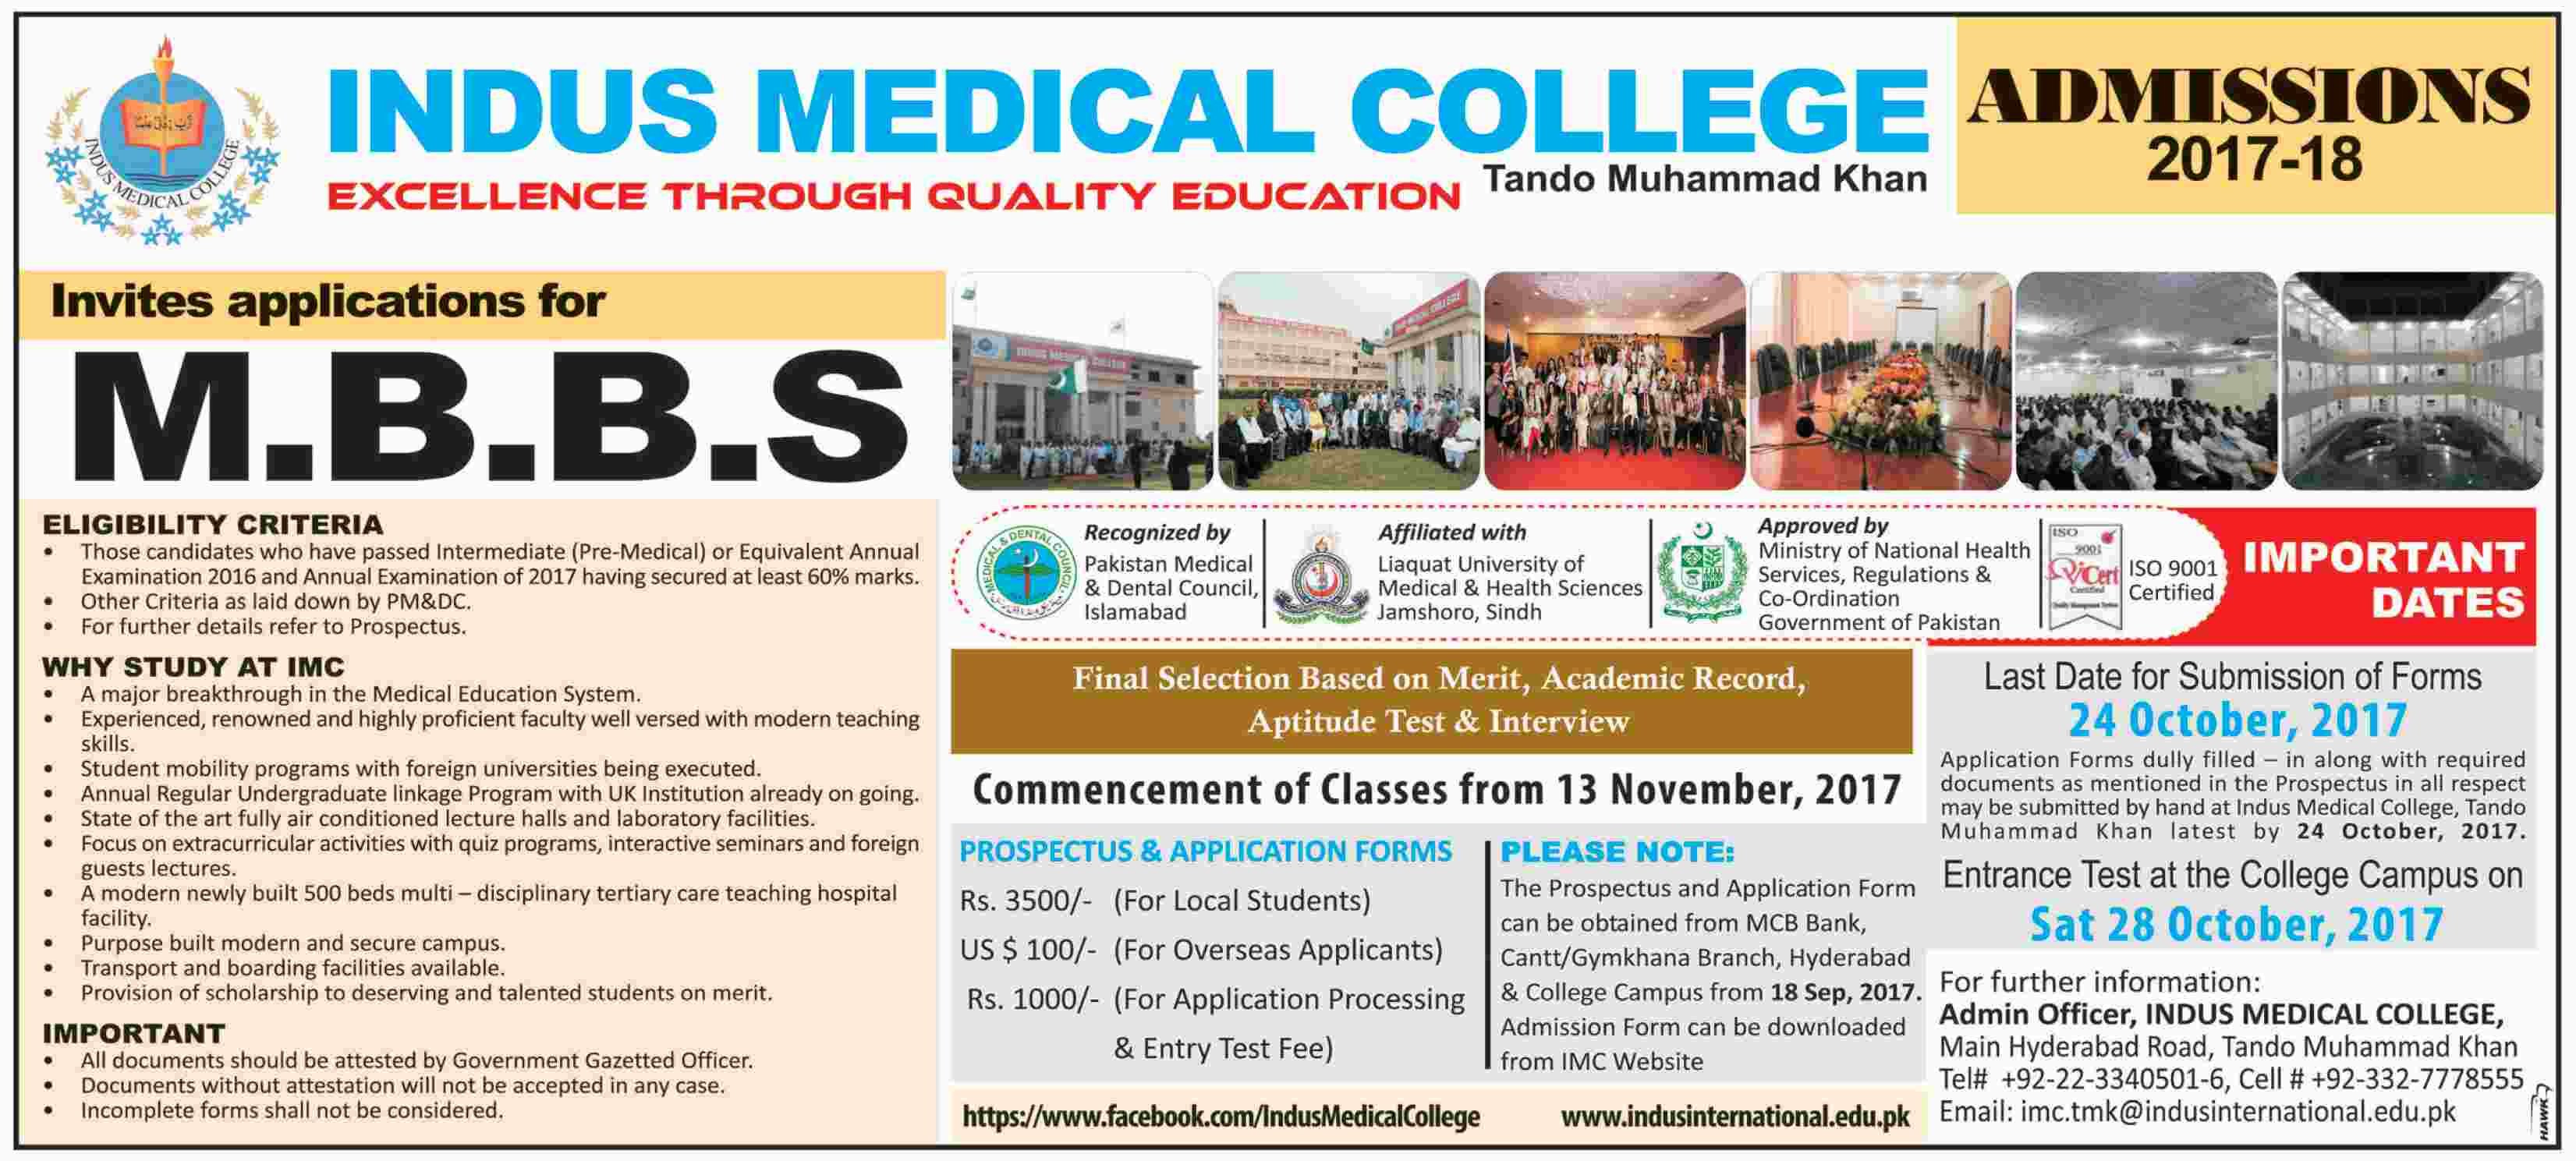 importance of merit based scholarships